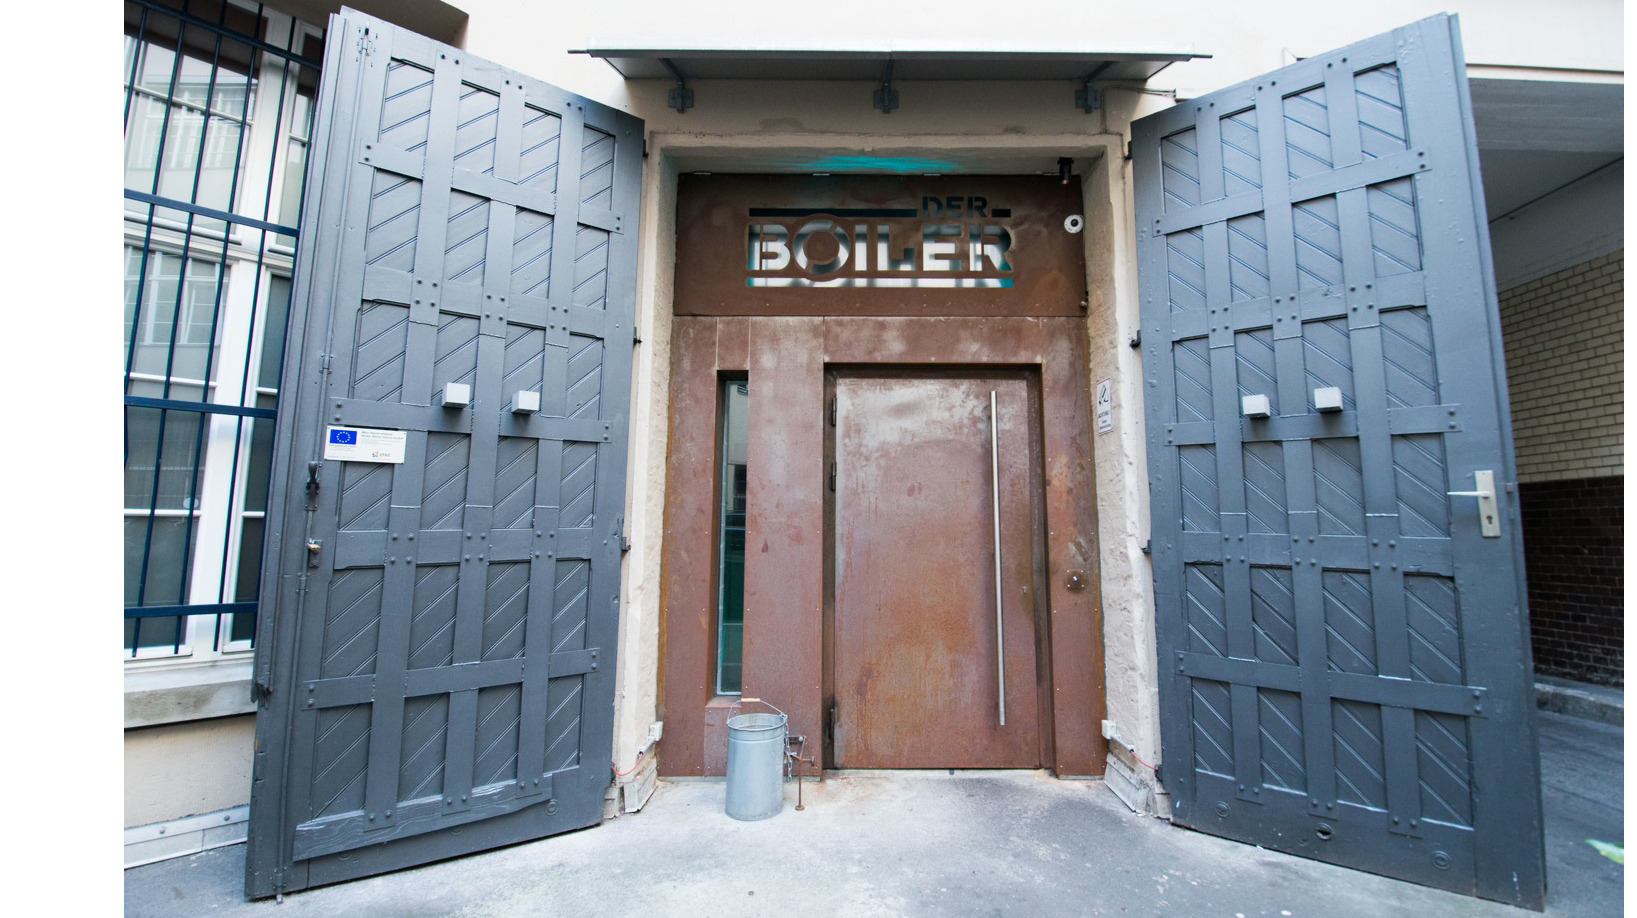 Der Boiler Sauna Berlin Gay